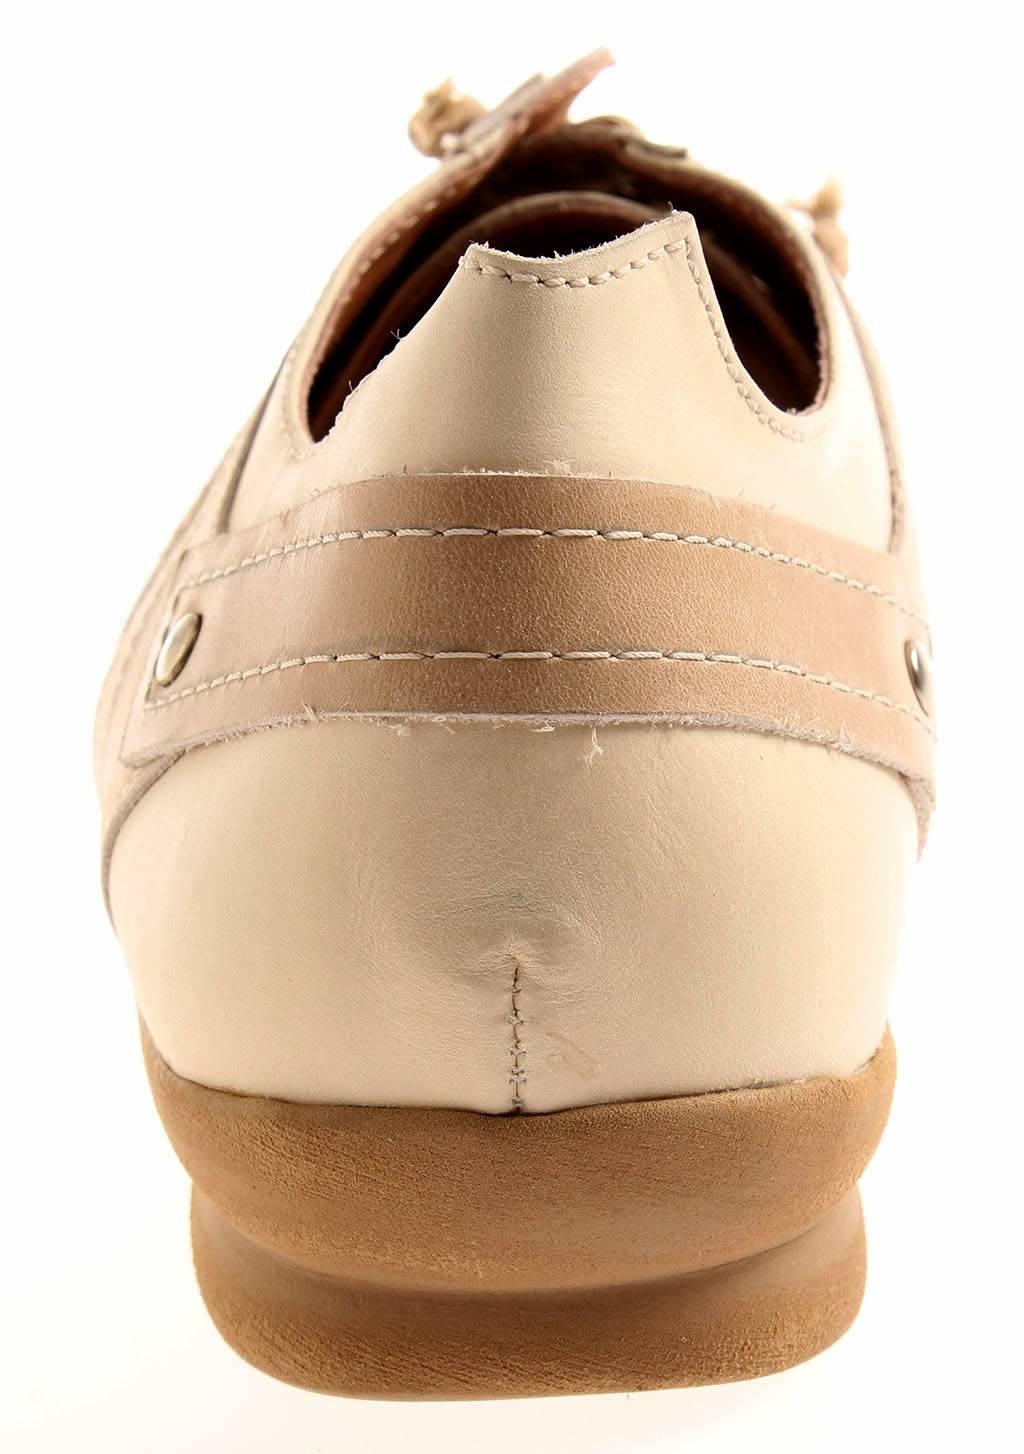 Theresia M. lose Damenschuhe Ledersneaker Leder Schuhe lose M. Einlagen M62252 baa094